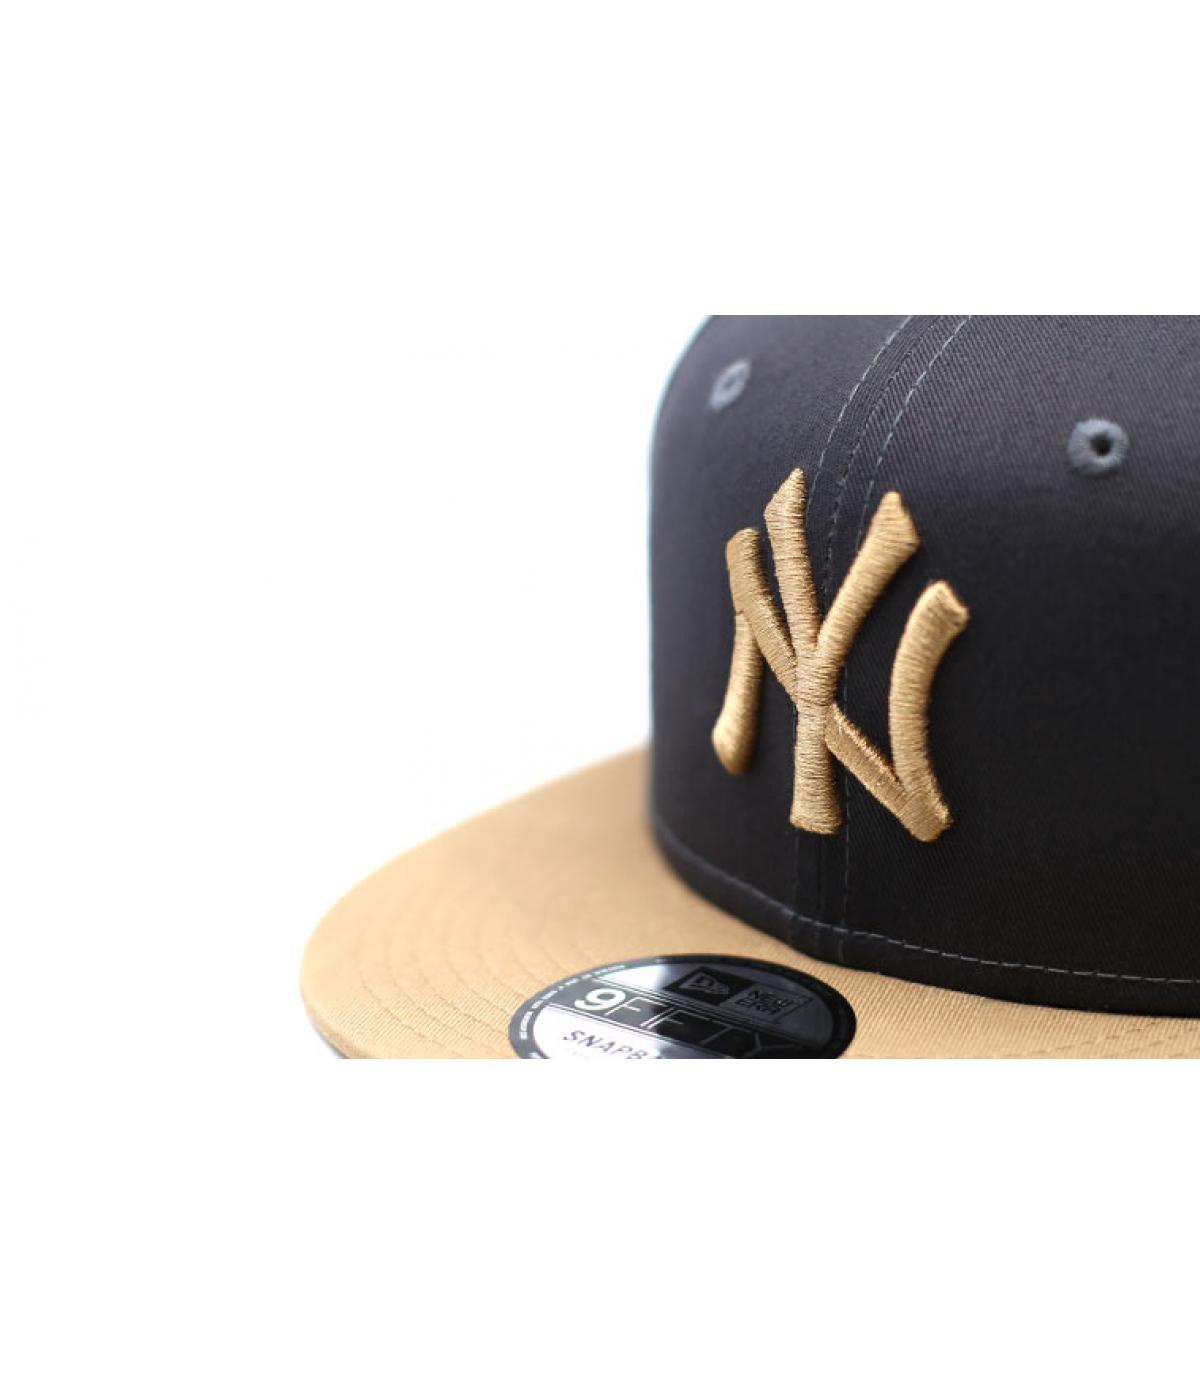 Details Snapback League Ess 9Fifty NY grey camel - Abbildung 3